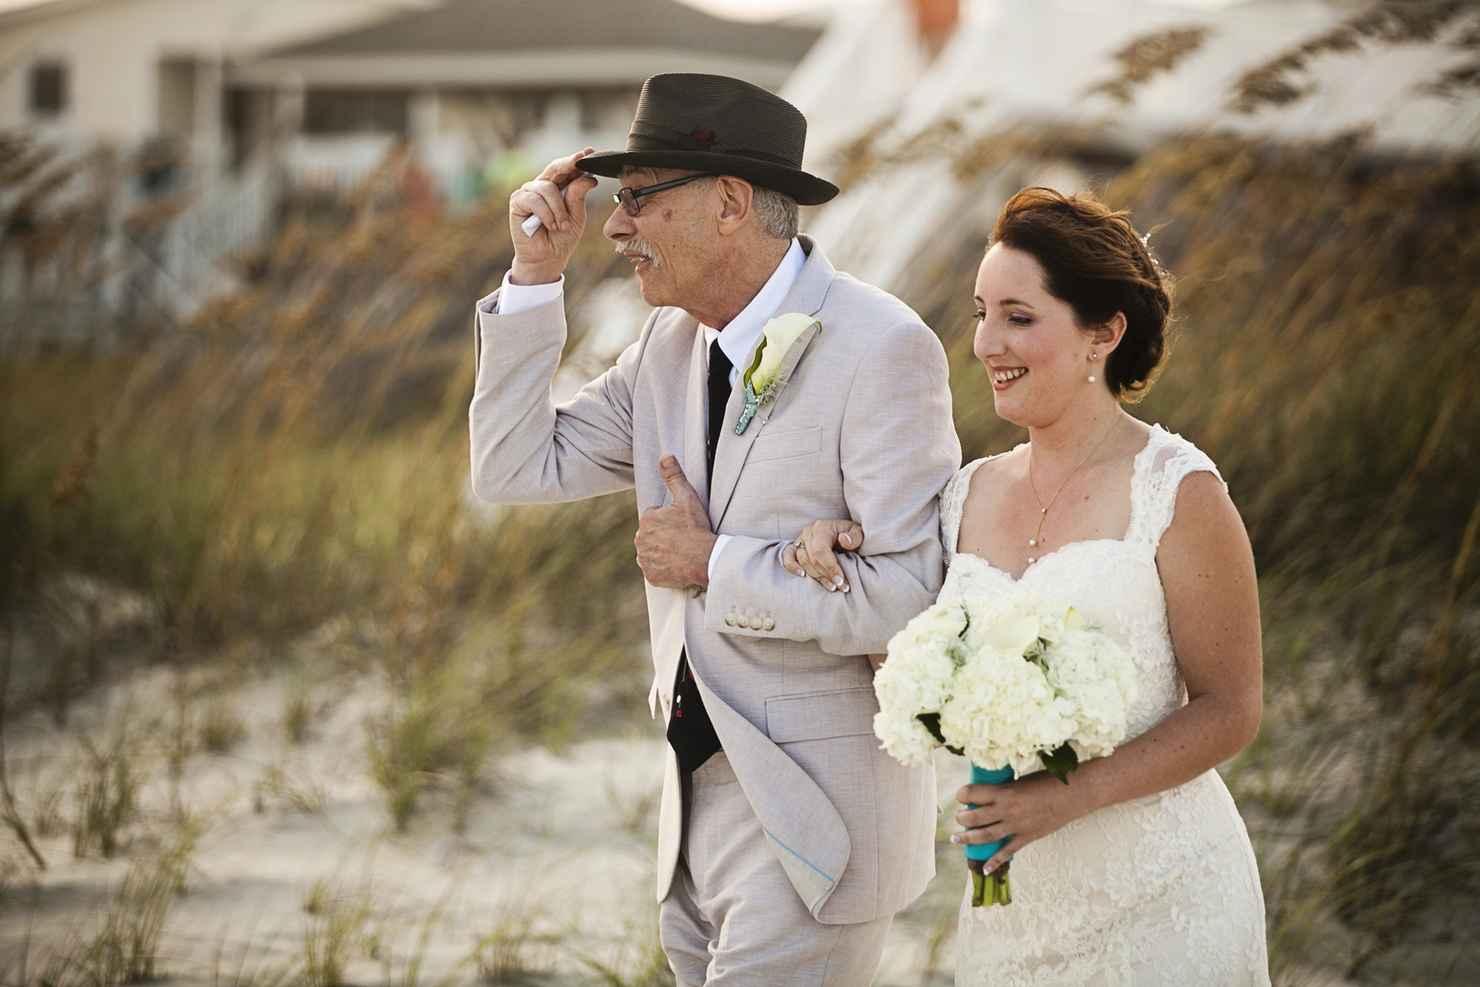 Brown wedding guests